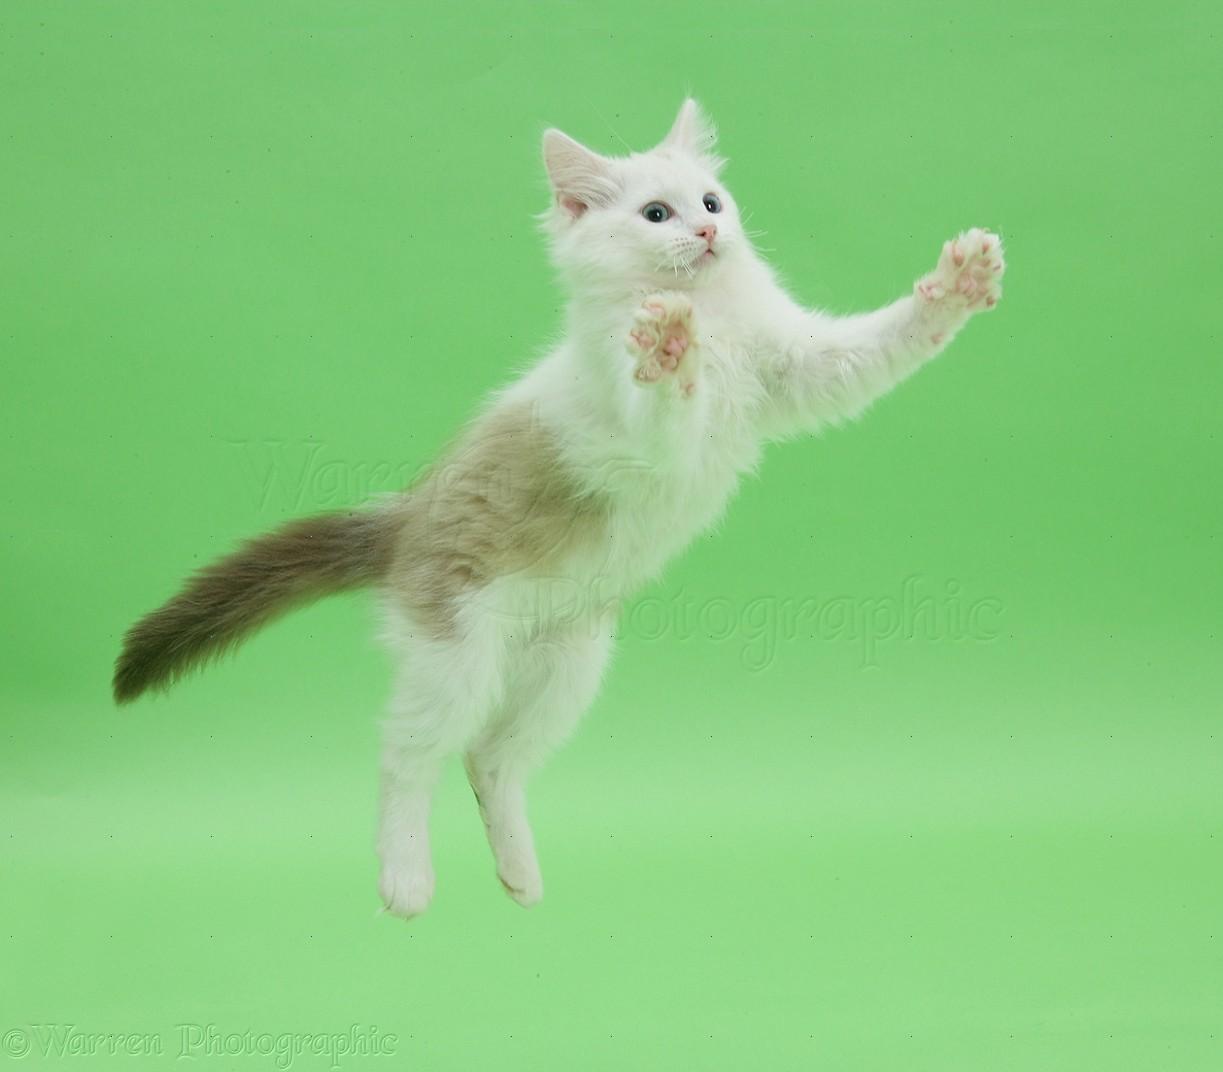 Birman x Ragdoll kitten leaping on green background photo - WP25074